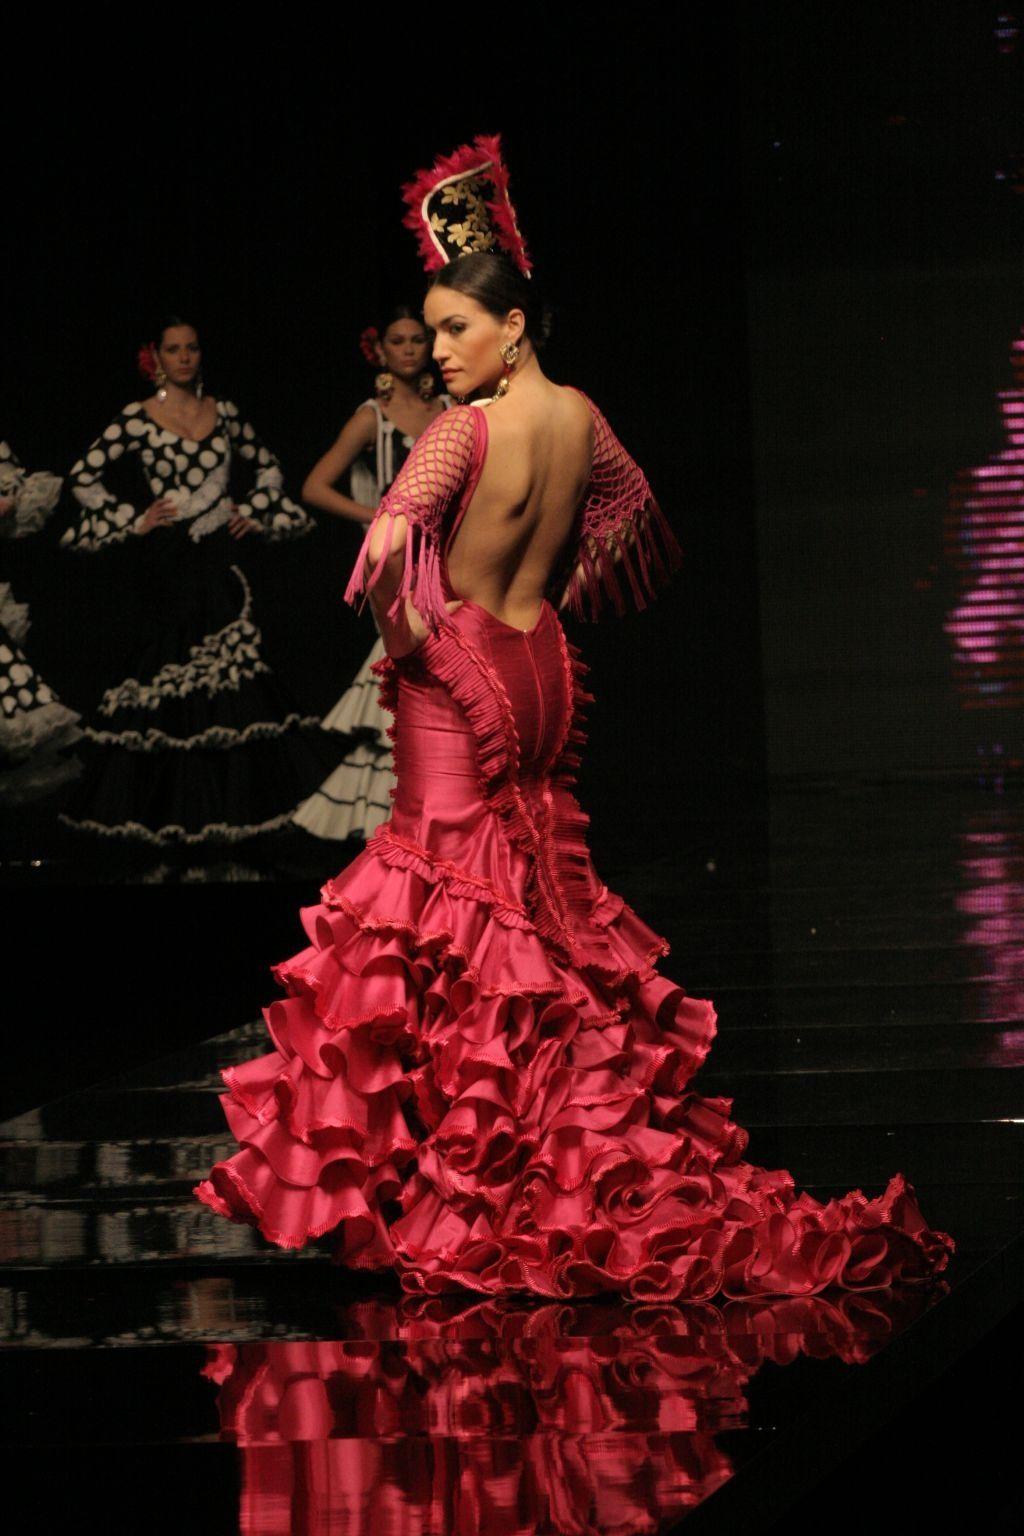 El Salón Internacional de la Moda Flamenca (SIMOF) reune ...